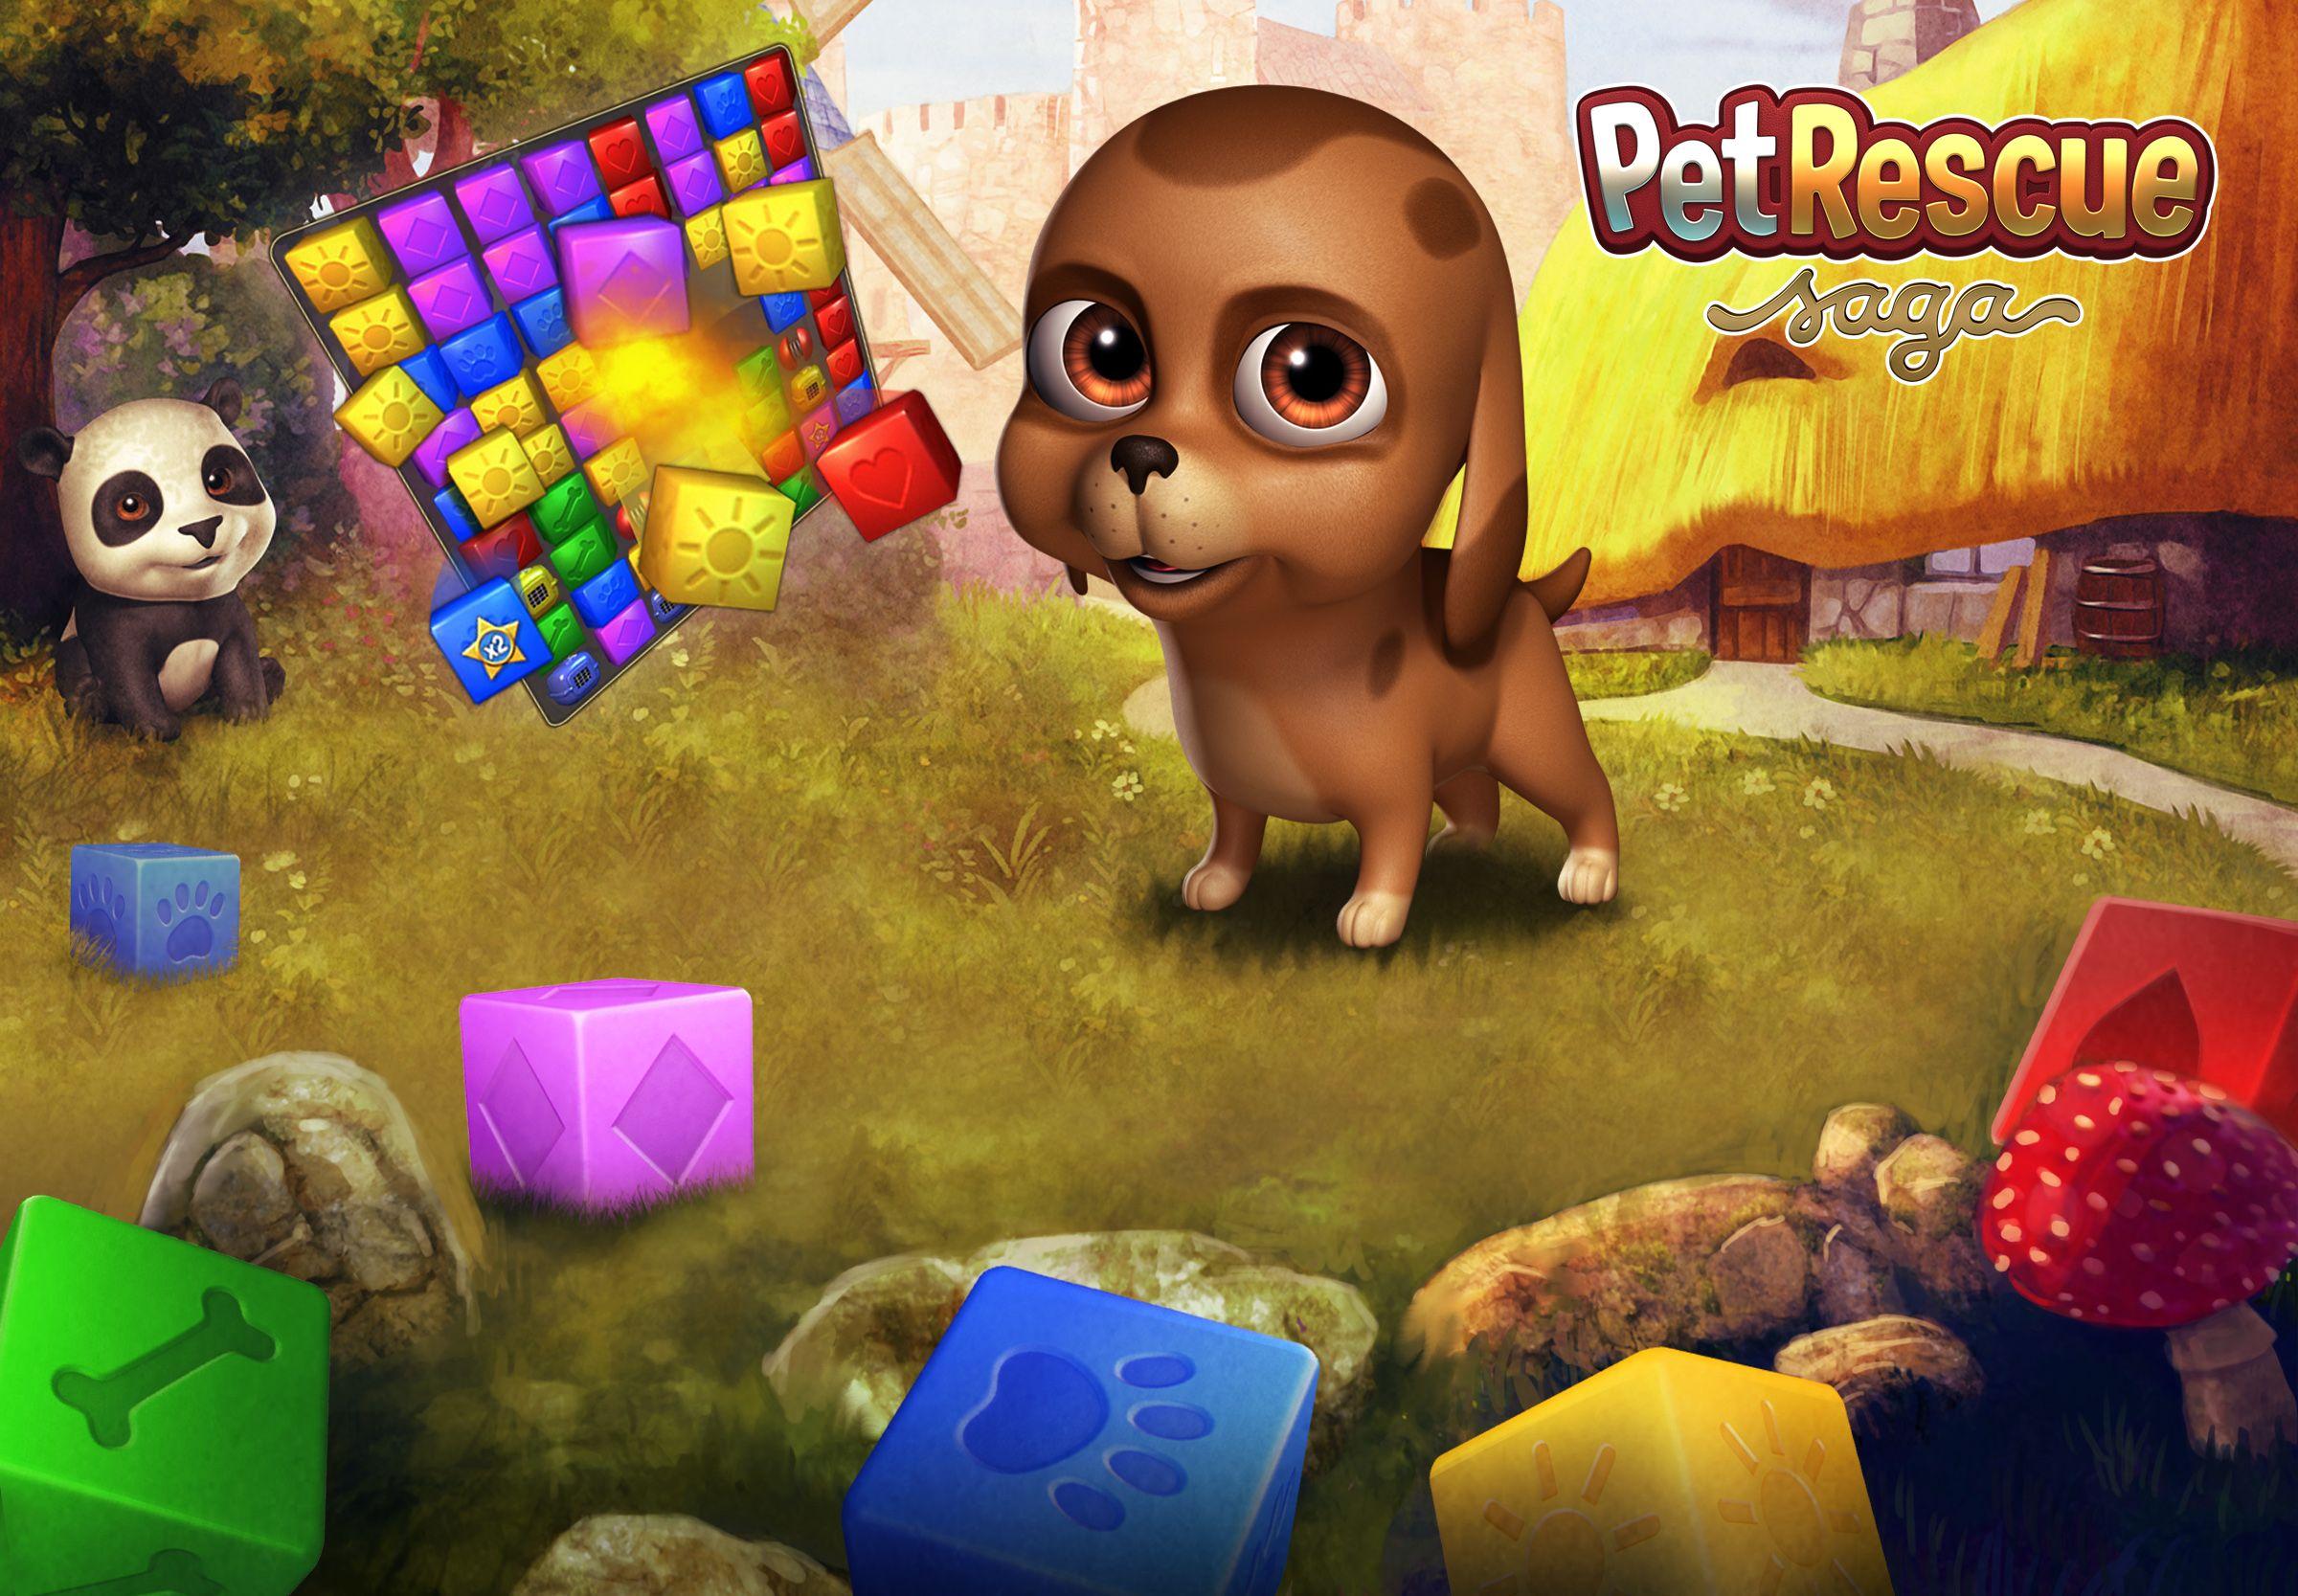 Pet Rescue Saga Kings game, Games, Pets